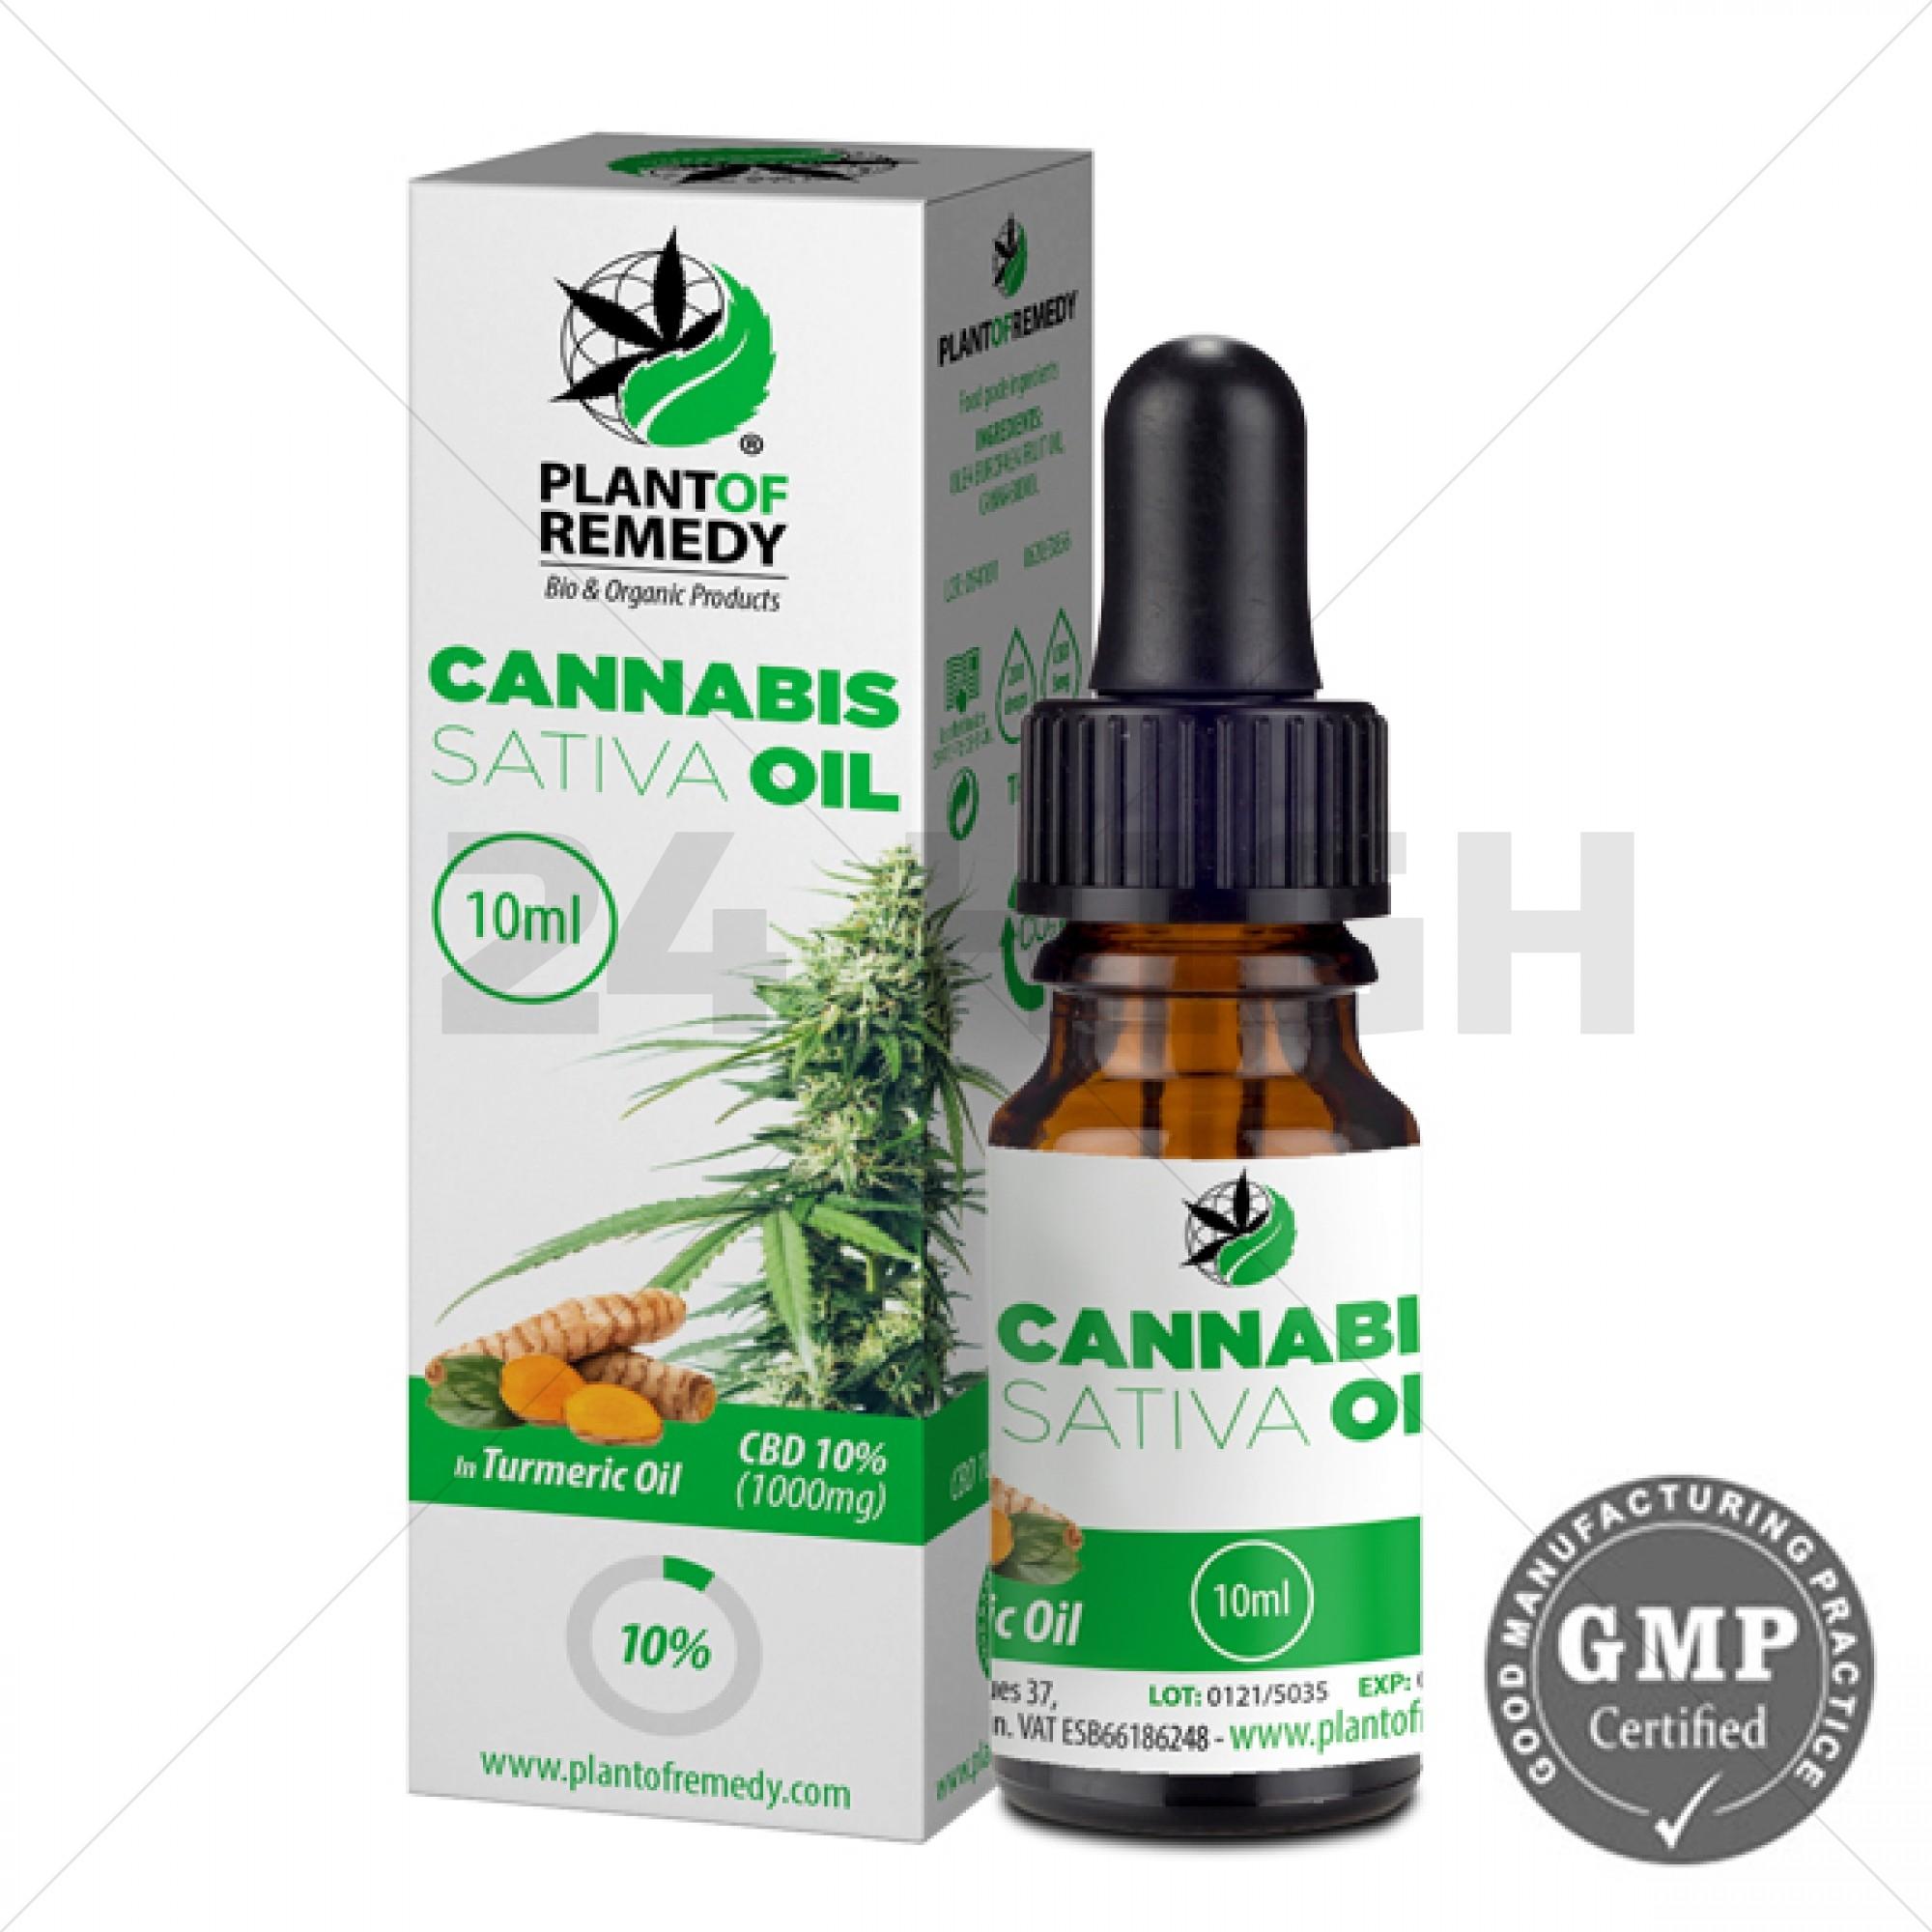 Plant of Remedy met Kurkuma Olie - 10% CBD (1000mg)